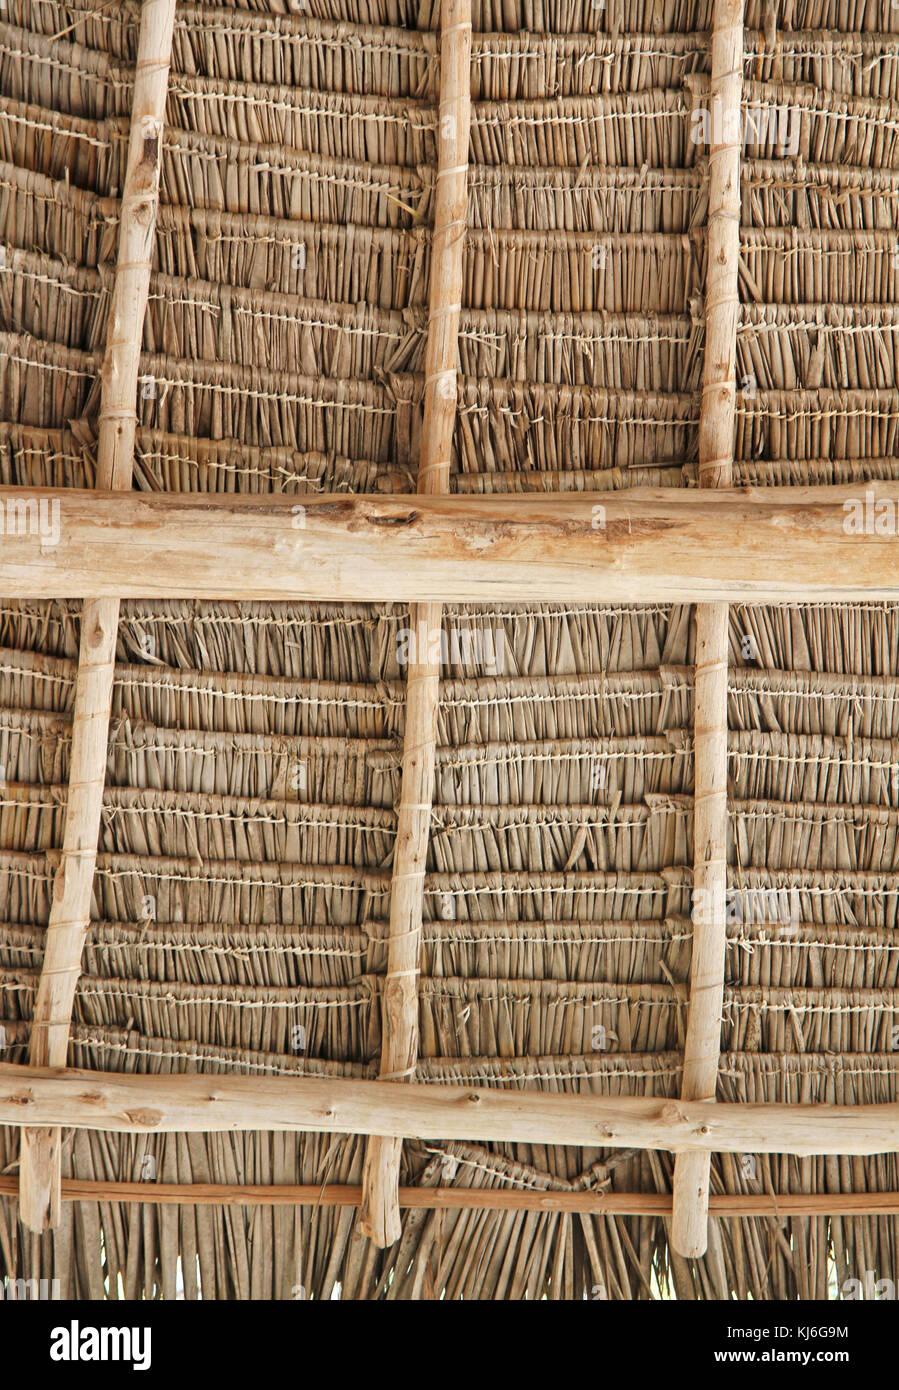 Thatched roofing, Unguja Island, Zanzibar, Tanzania - Stock Image